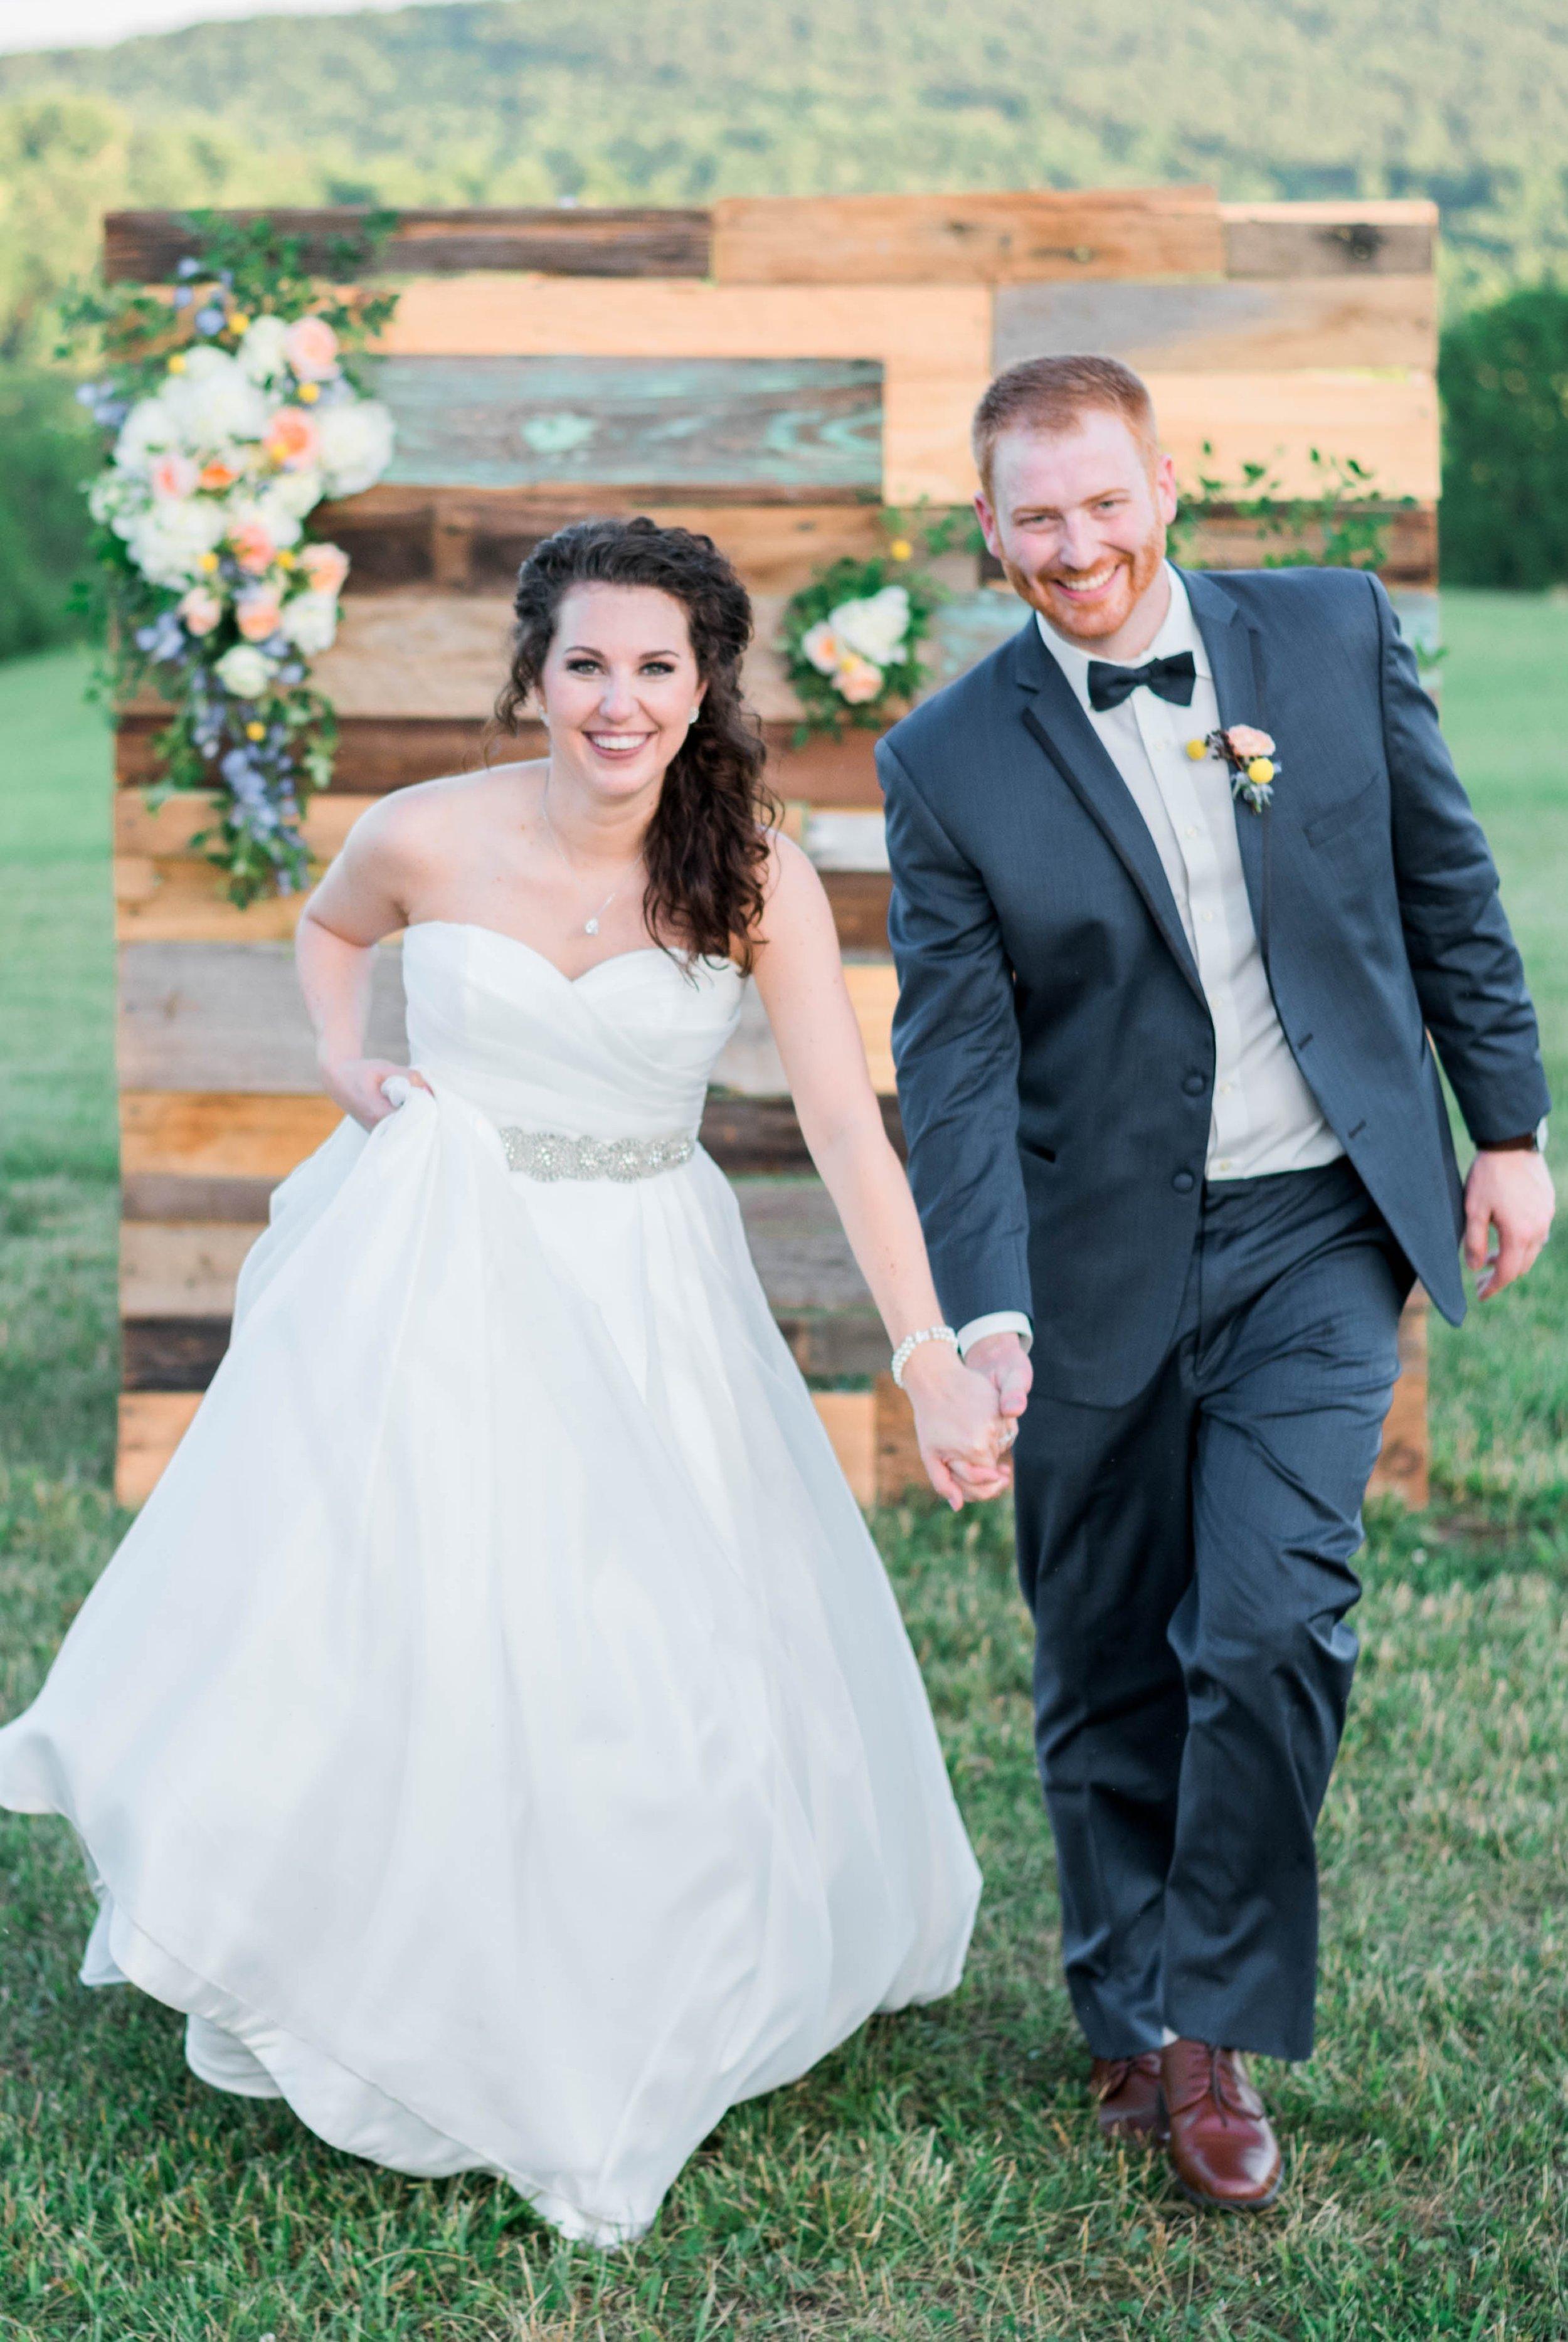 SorellaFarms_EvingtonVA_Lynchburgweddingphotographer_VirginiaweddingPhotographer_AshleyAndrewSorellaFarmsWedding 31.jpg